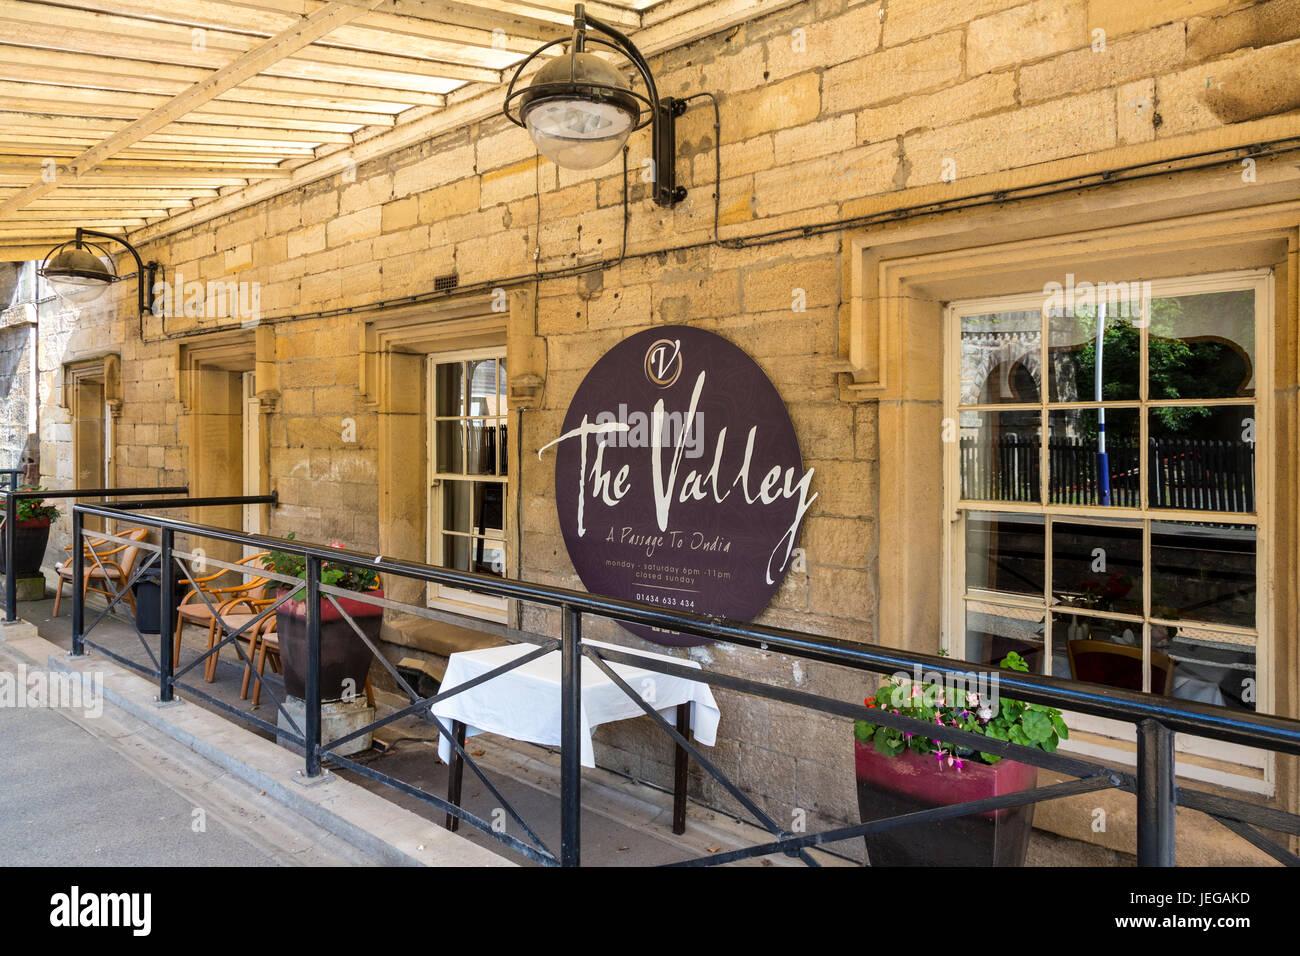 Corbridge, Northumberland, England, UK.  The Valley Indian Restaurant, repurposed from former train station. - Stock Image